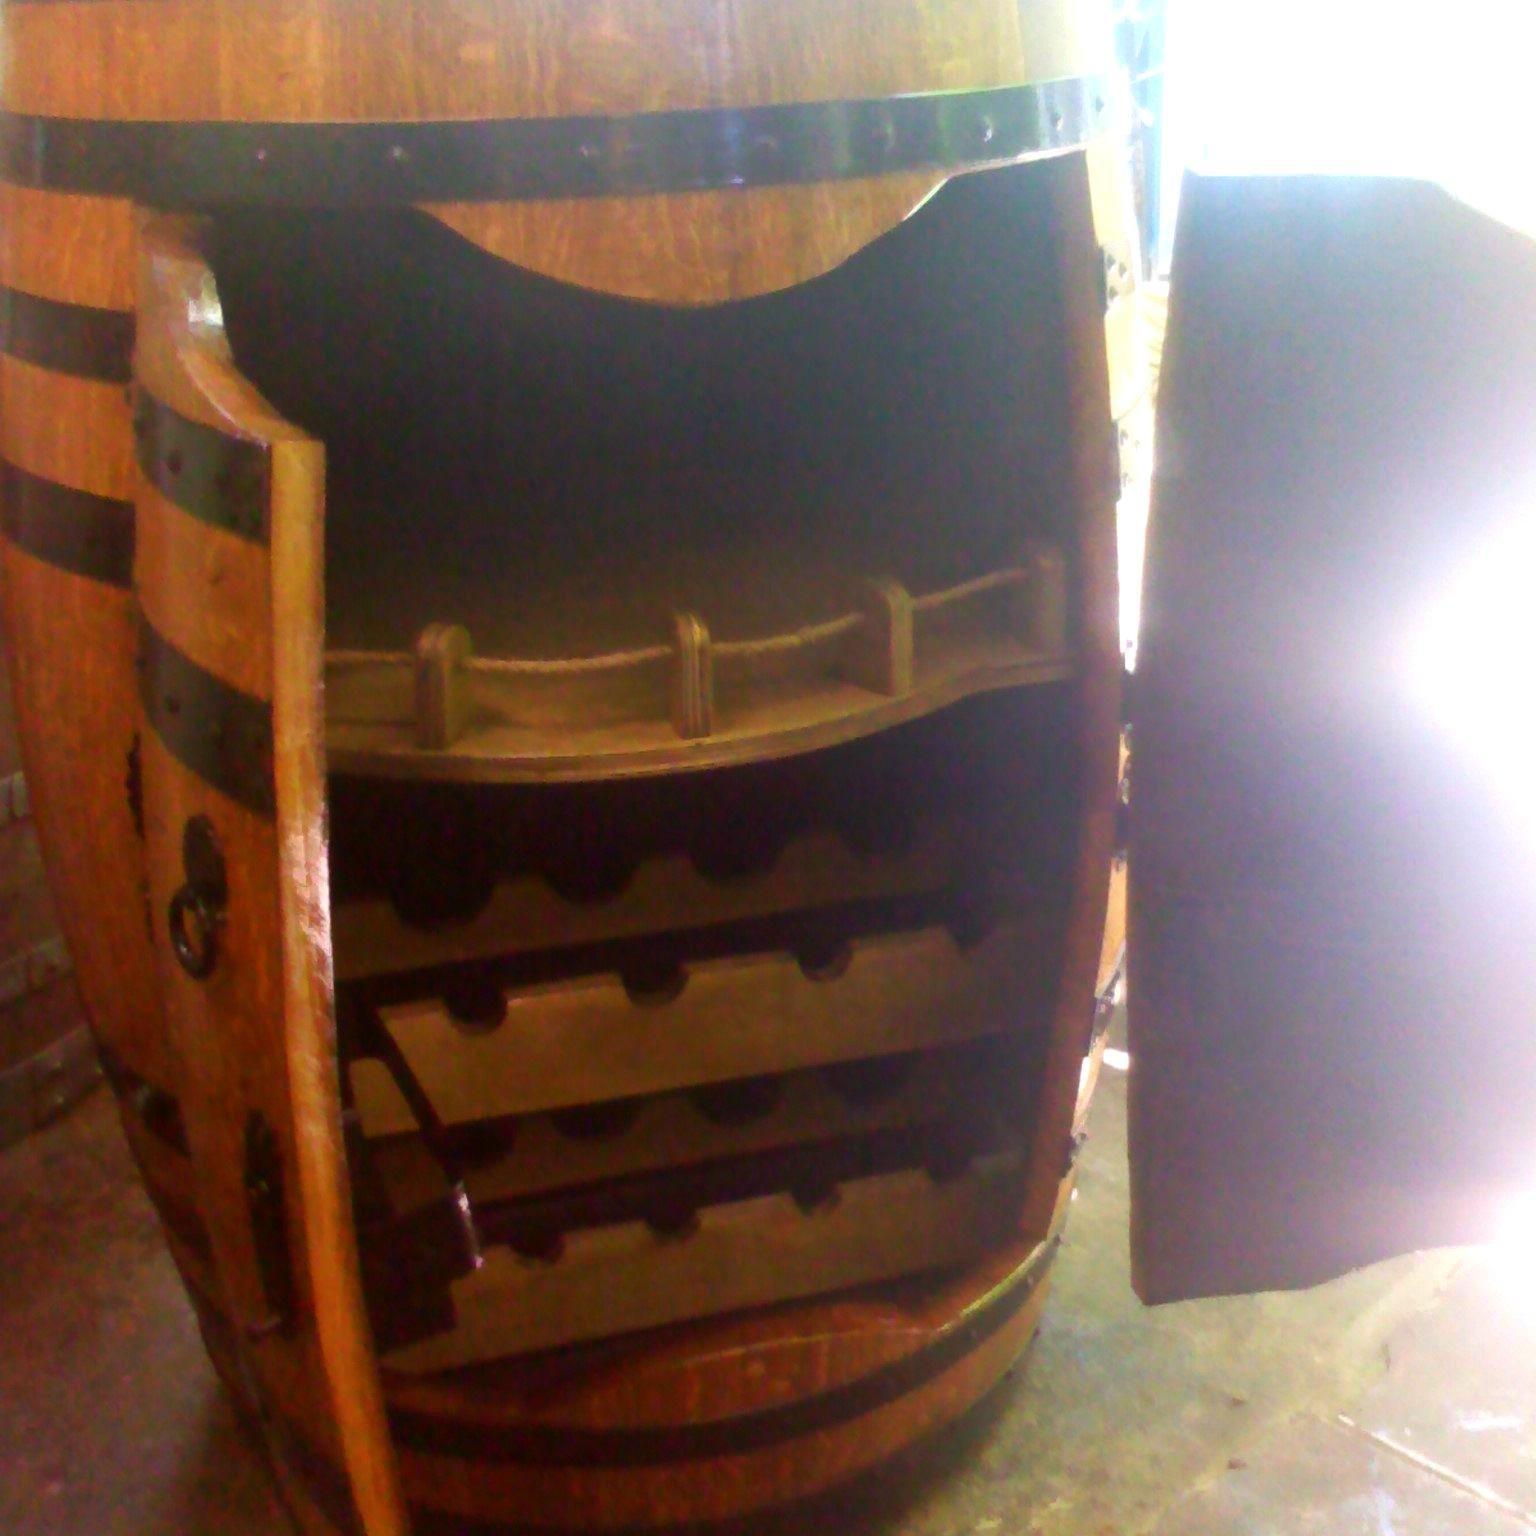 Artesania en barrica arte barricas twitter for Bar de madera chile